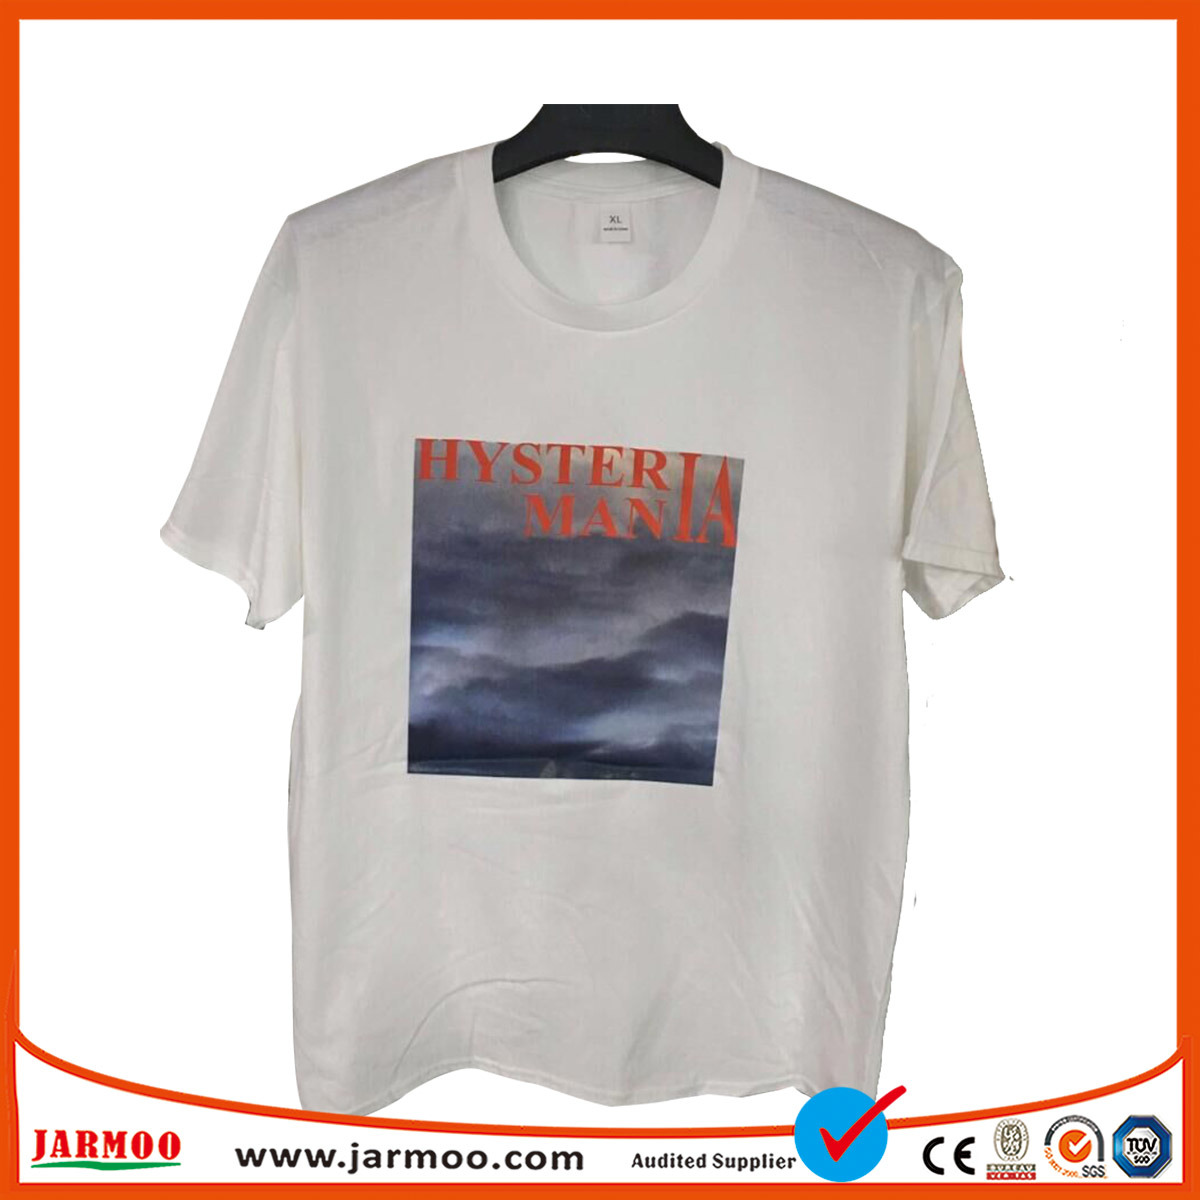 2dec5bc46 China OEM Service Design Your Own Organic Cotton White T Shirt - China T  Shirt, Polo Shirt